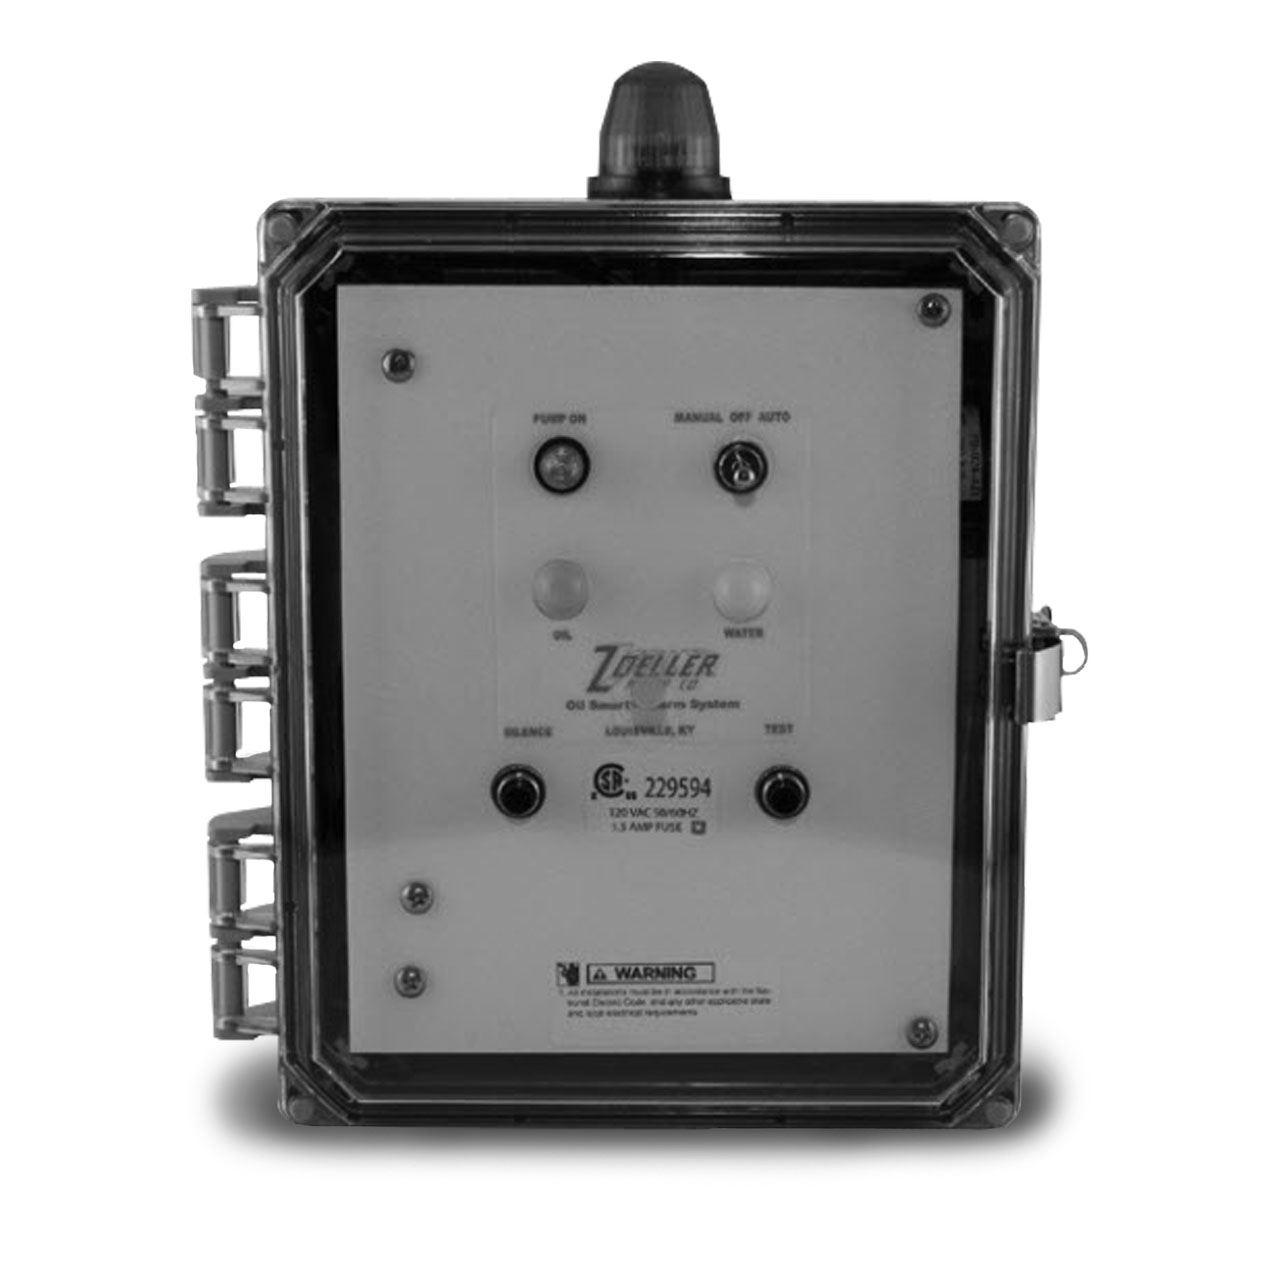 medium resolution of zoeller duplex pump control panel wiring diagram zoeller zoeller 10 2149 oil smart